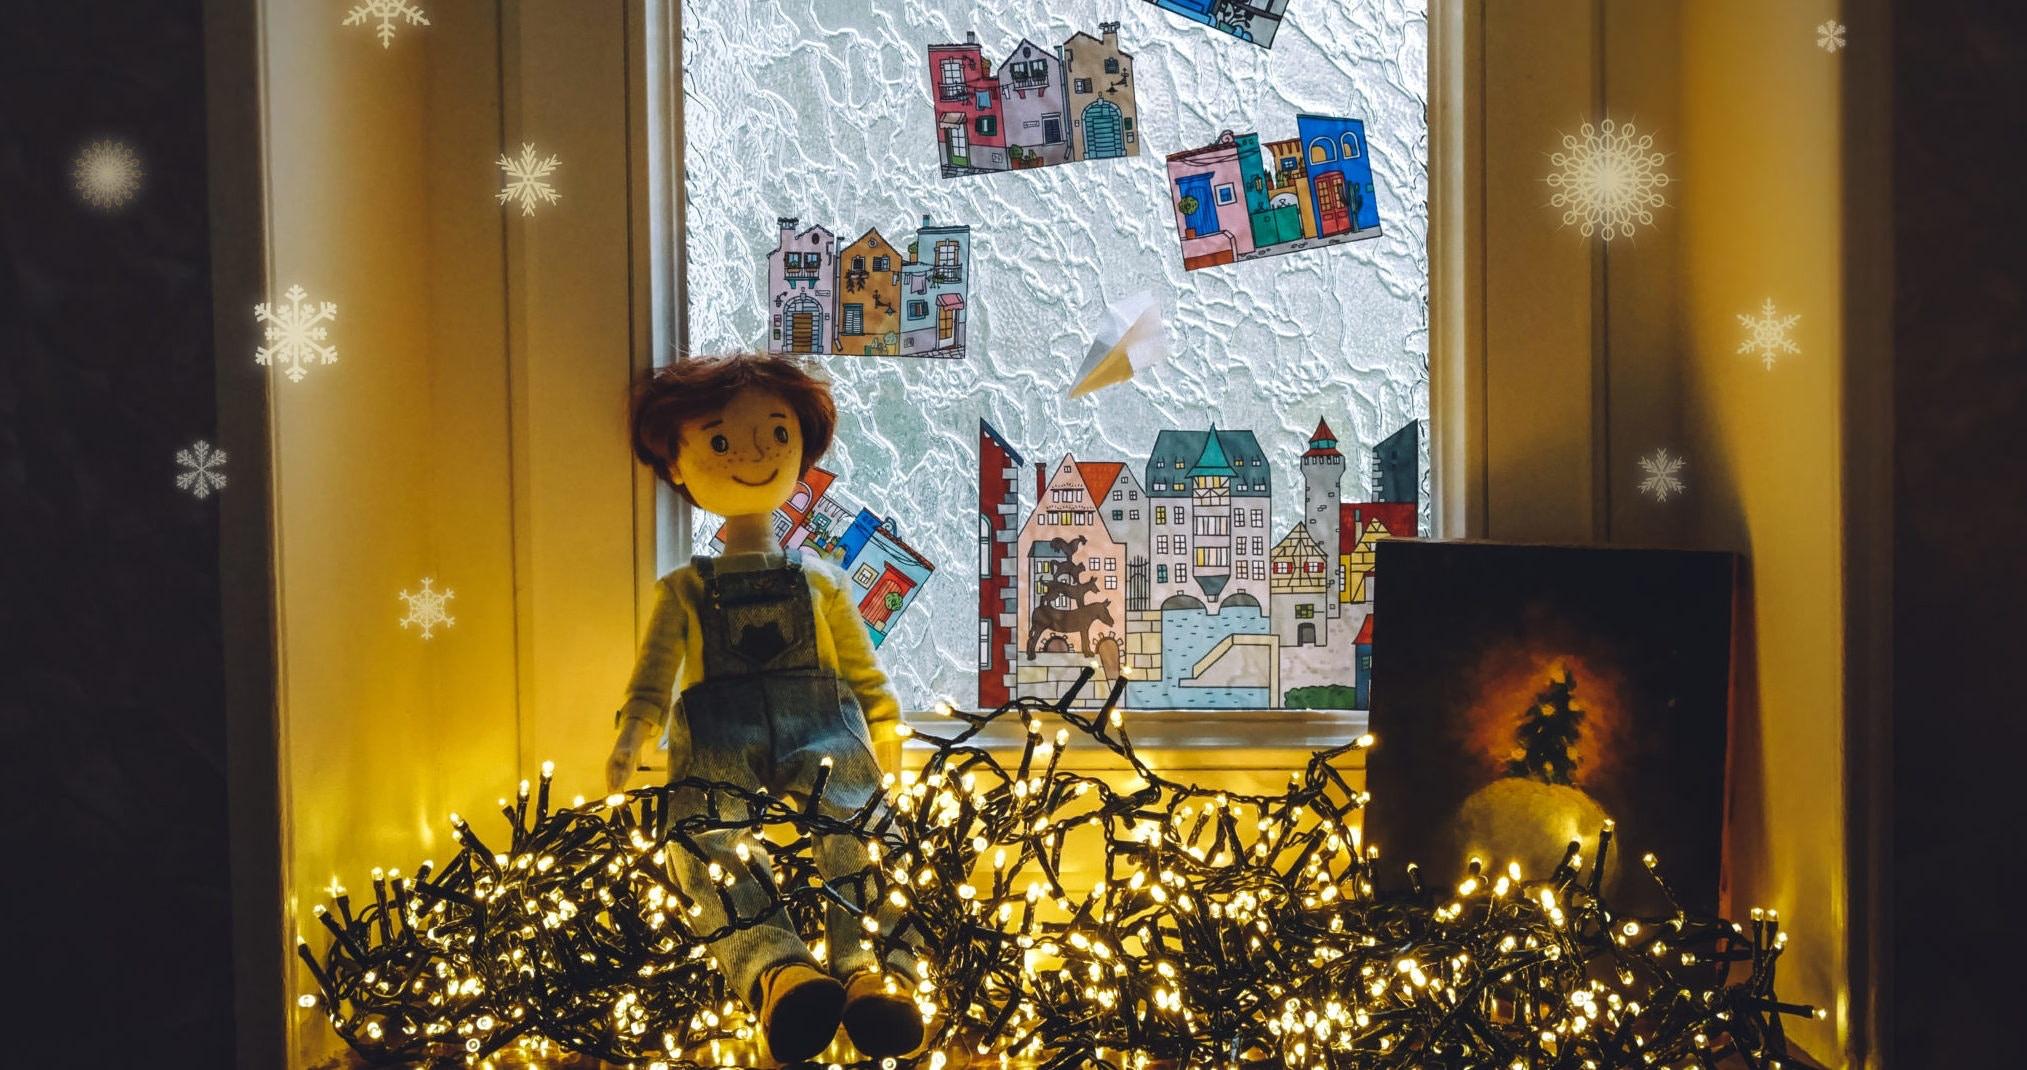 3 часть. Вилли спасает Деда Мороза